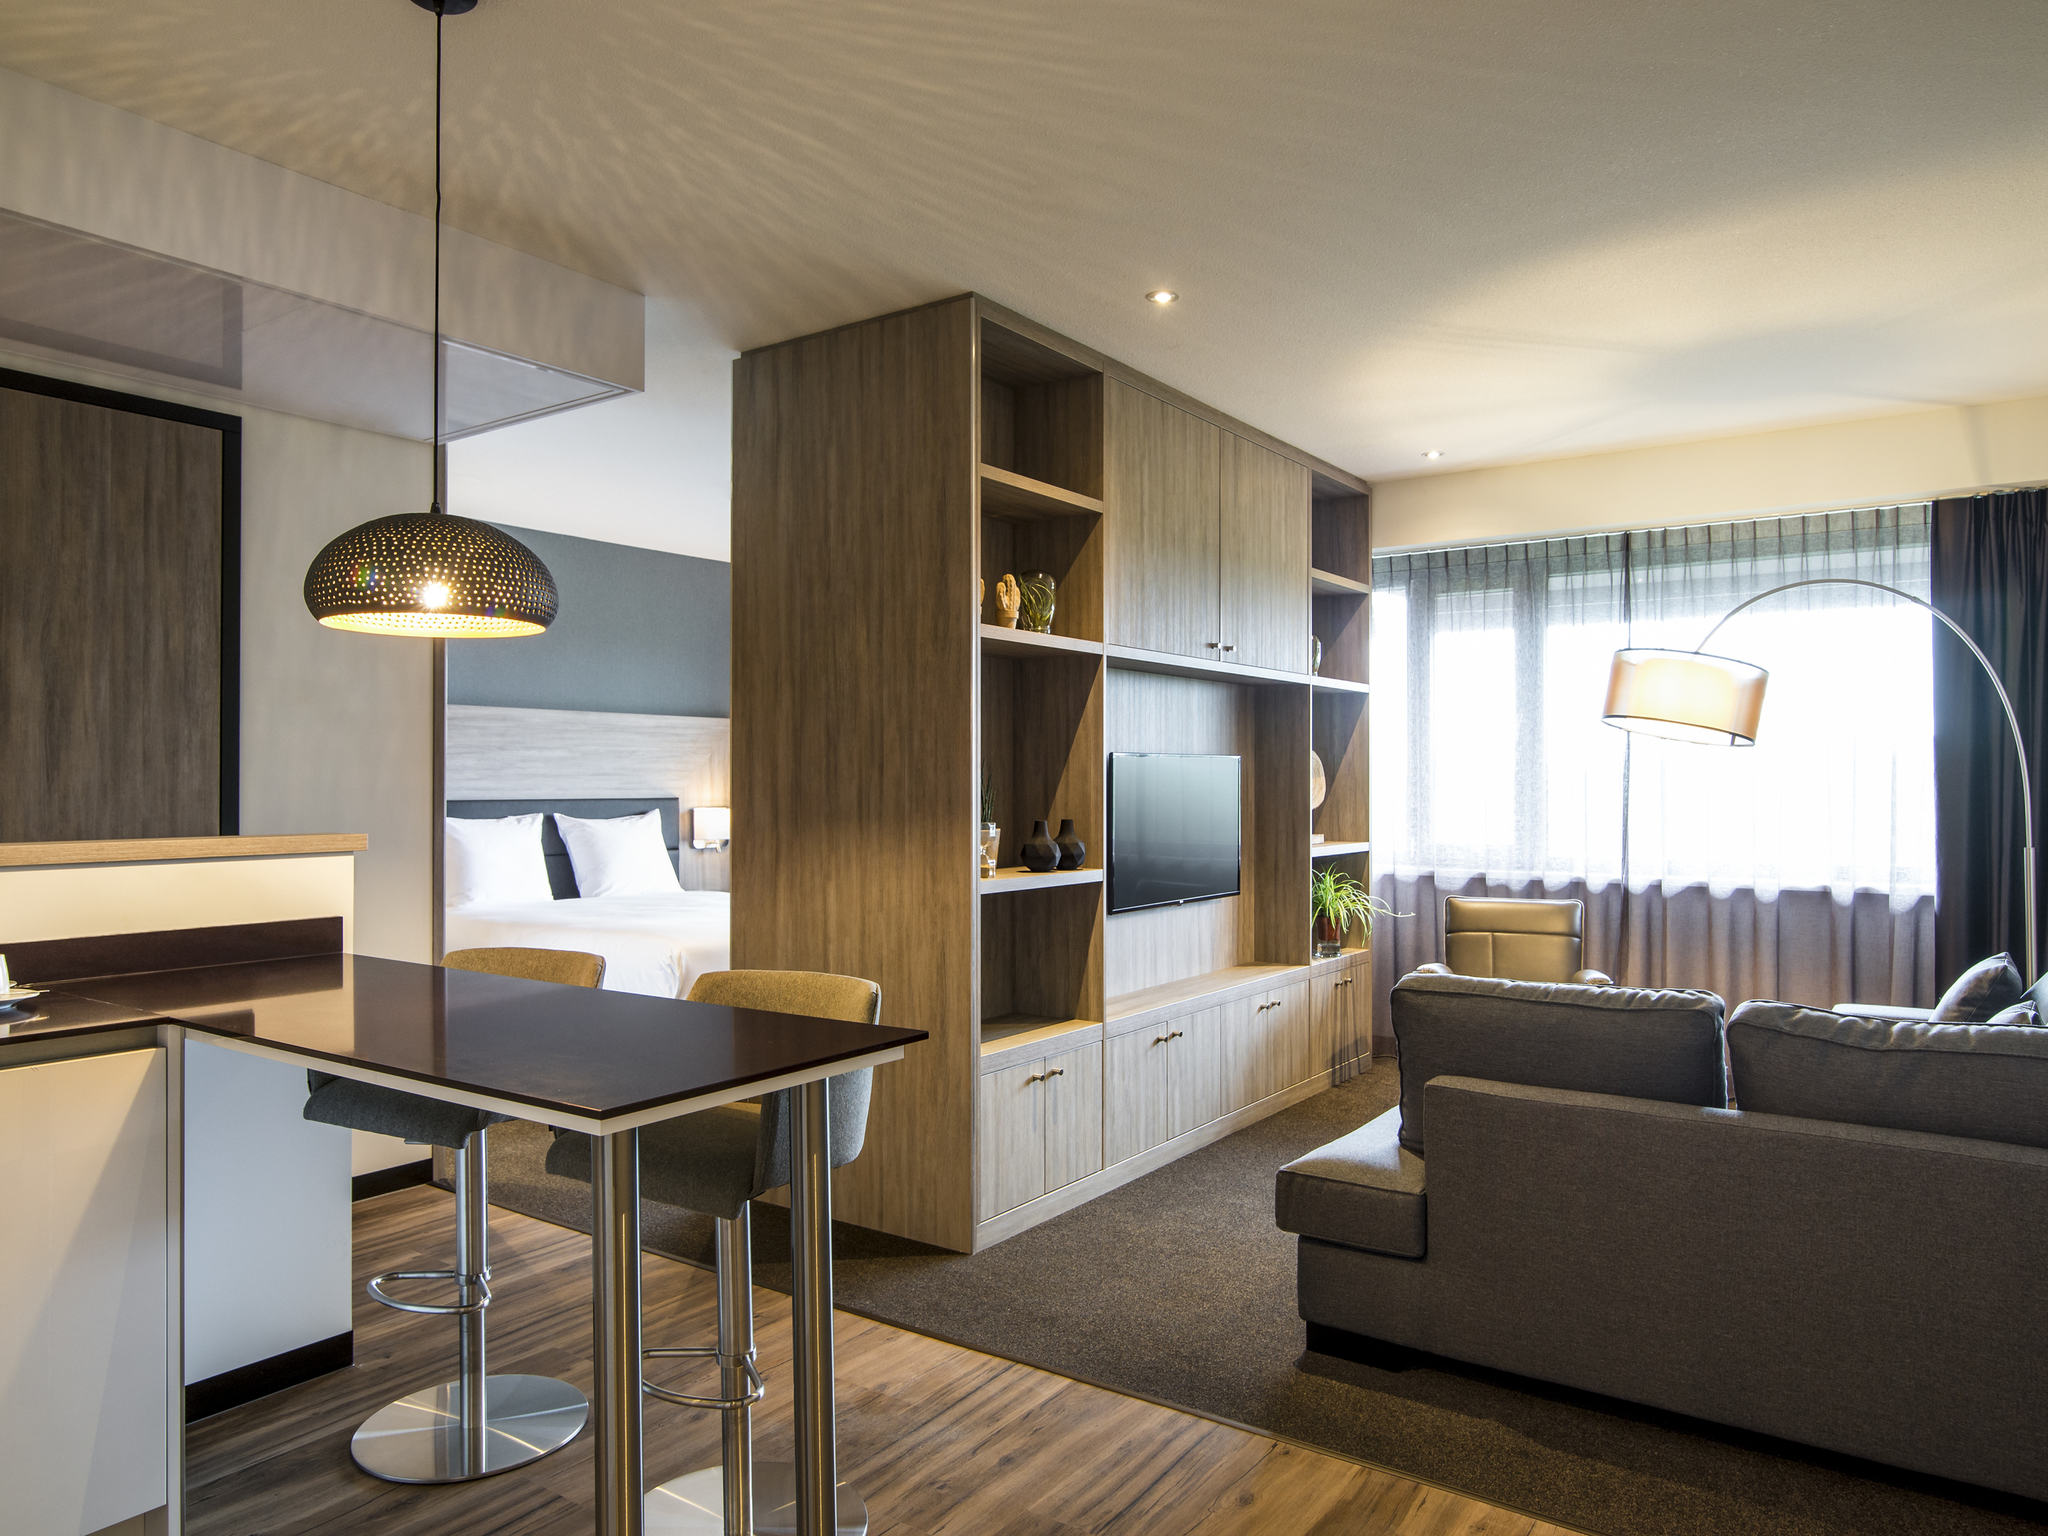 فندق - أداجيو Adagio أمستردام سيتي ساوث